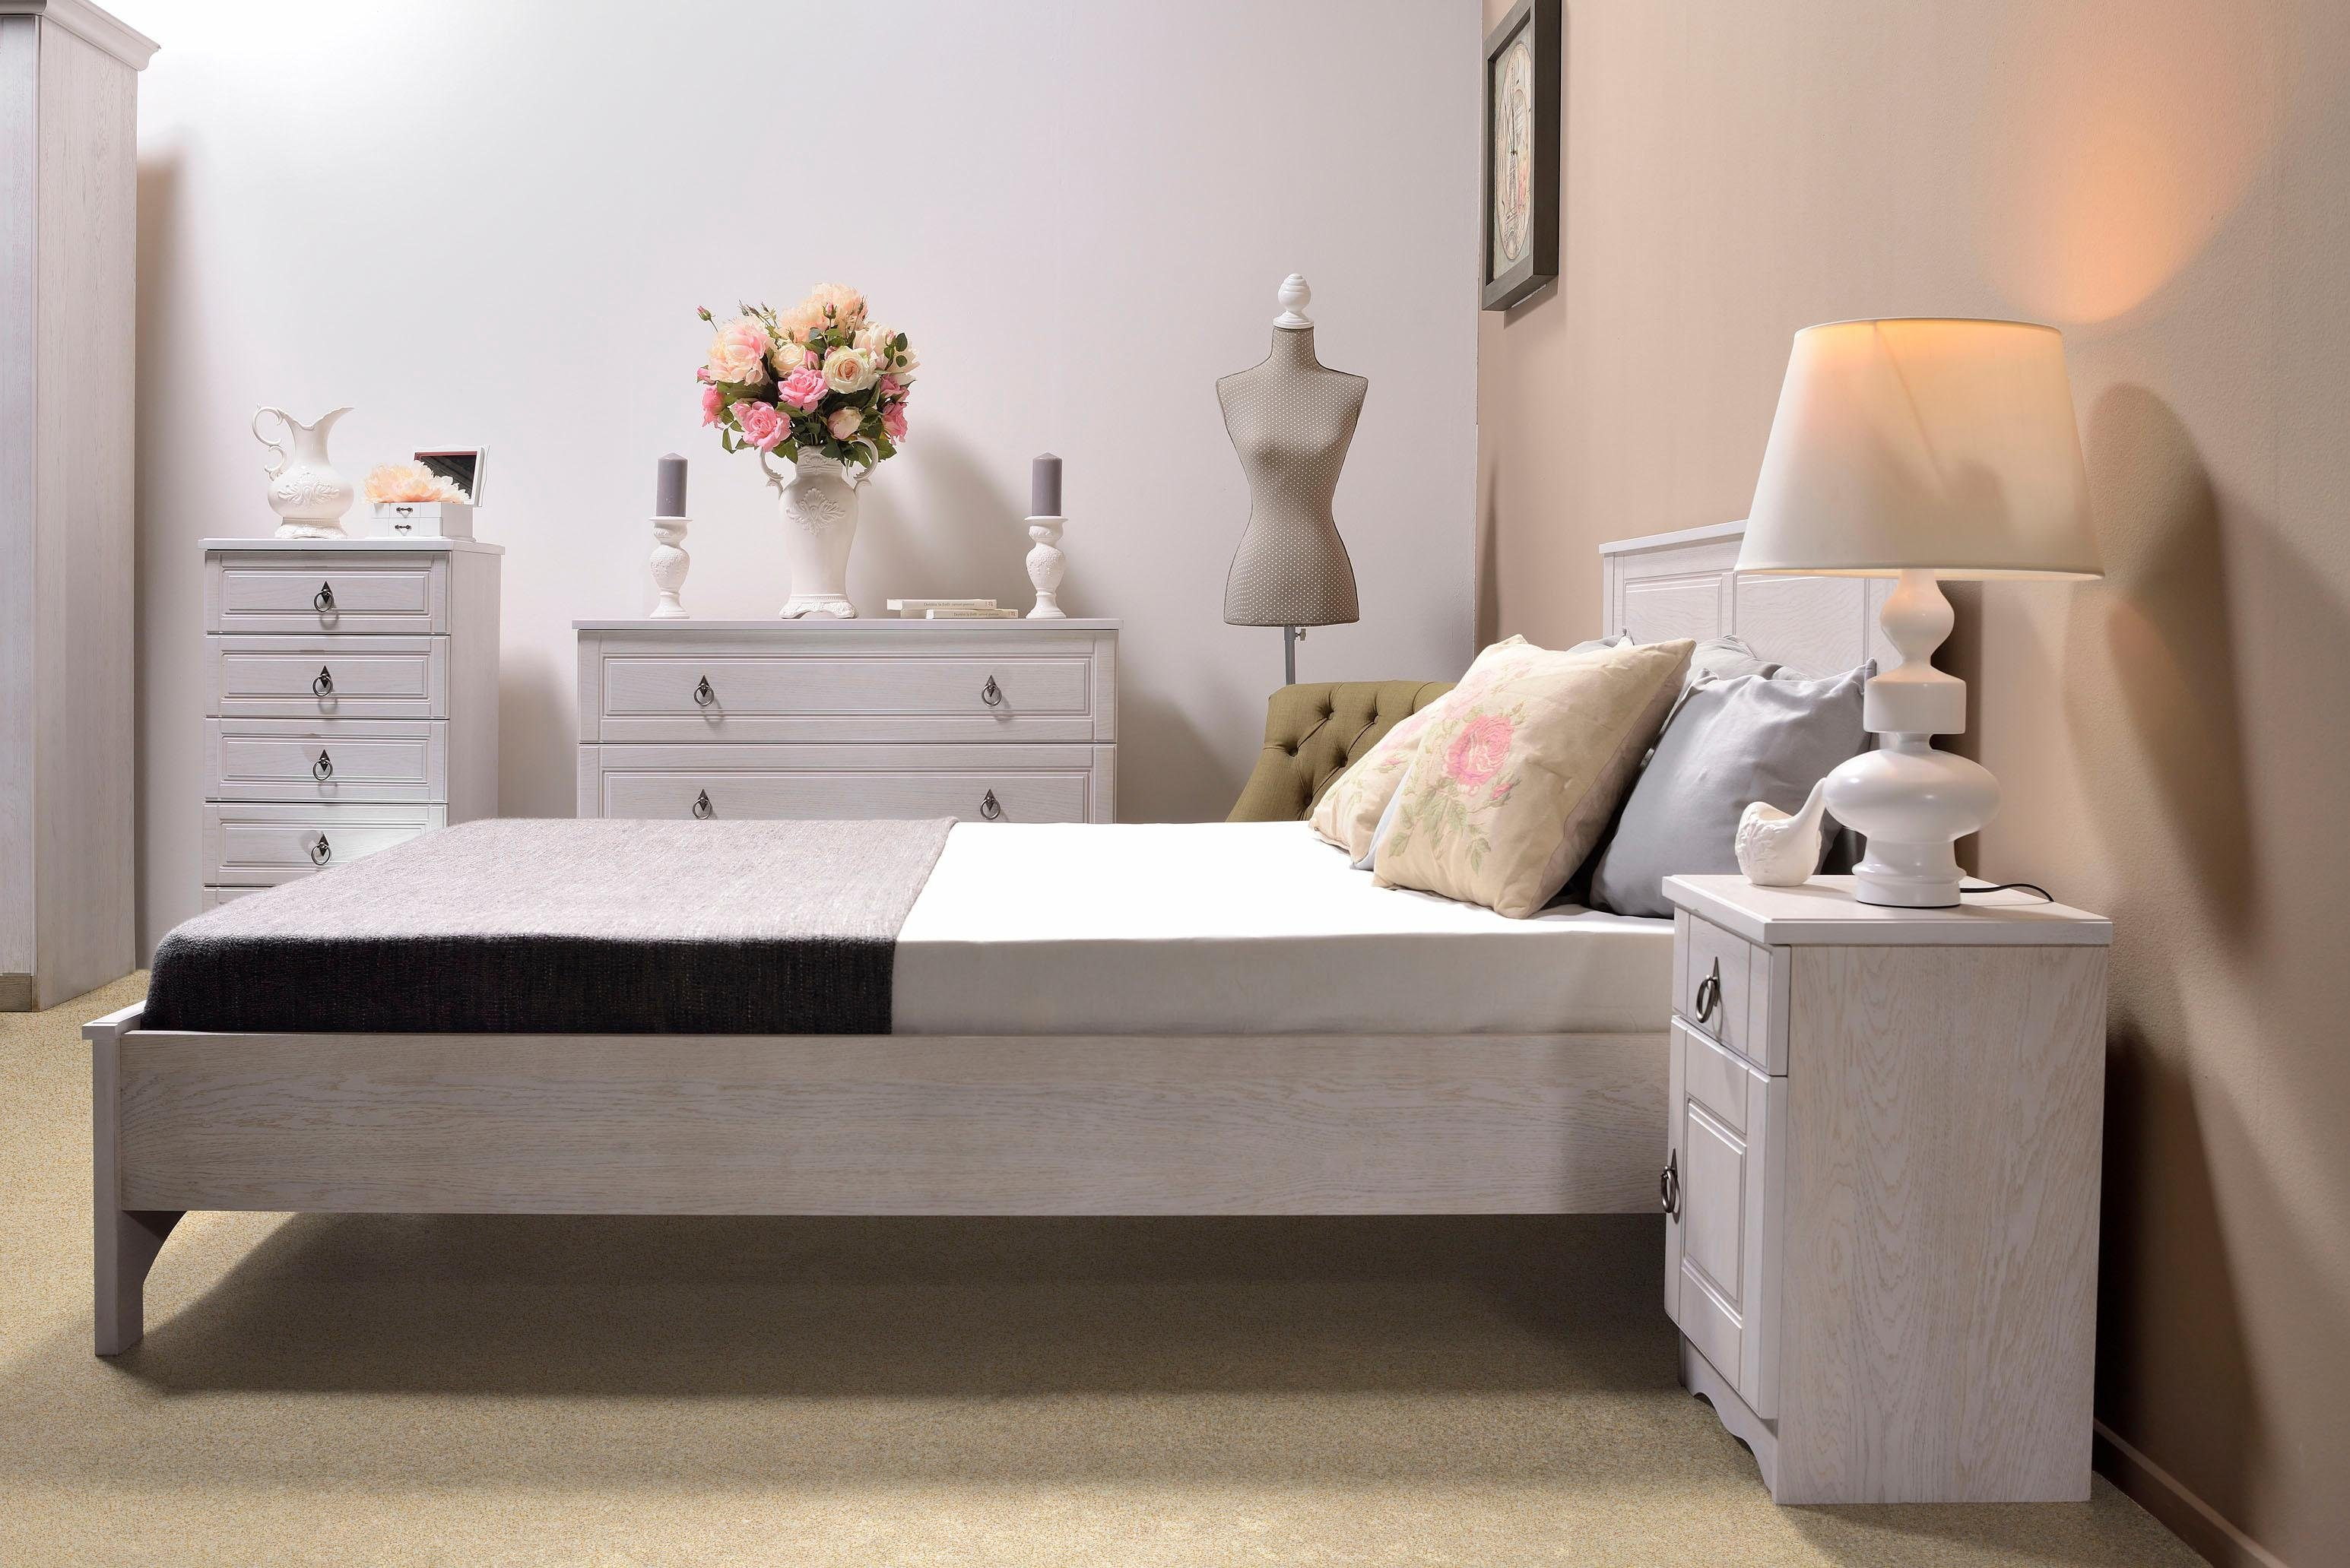 Home affaire Bett »Blanca« 160 cm breite Liegefläche, ohne Fußboard